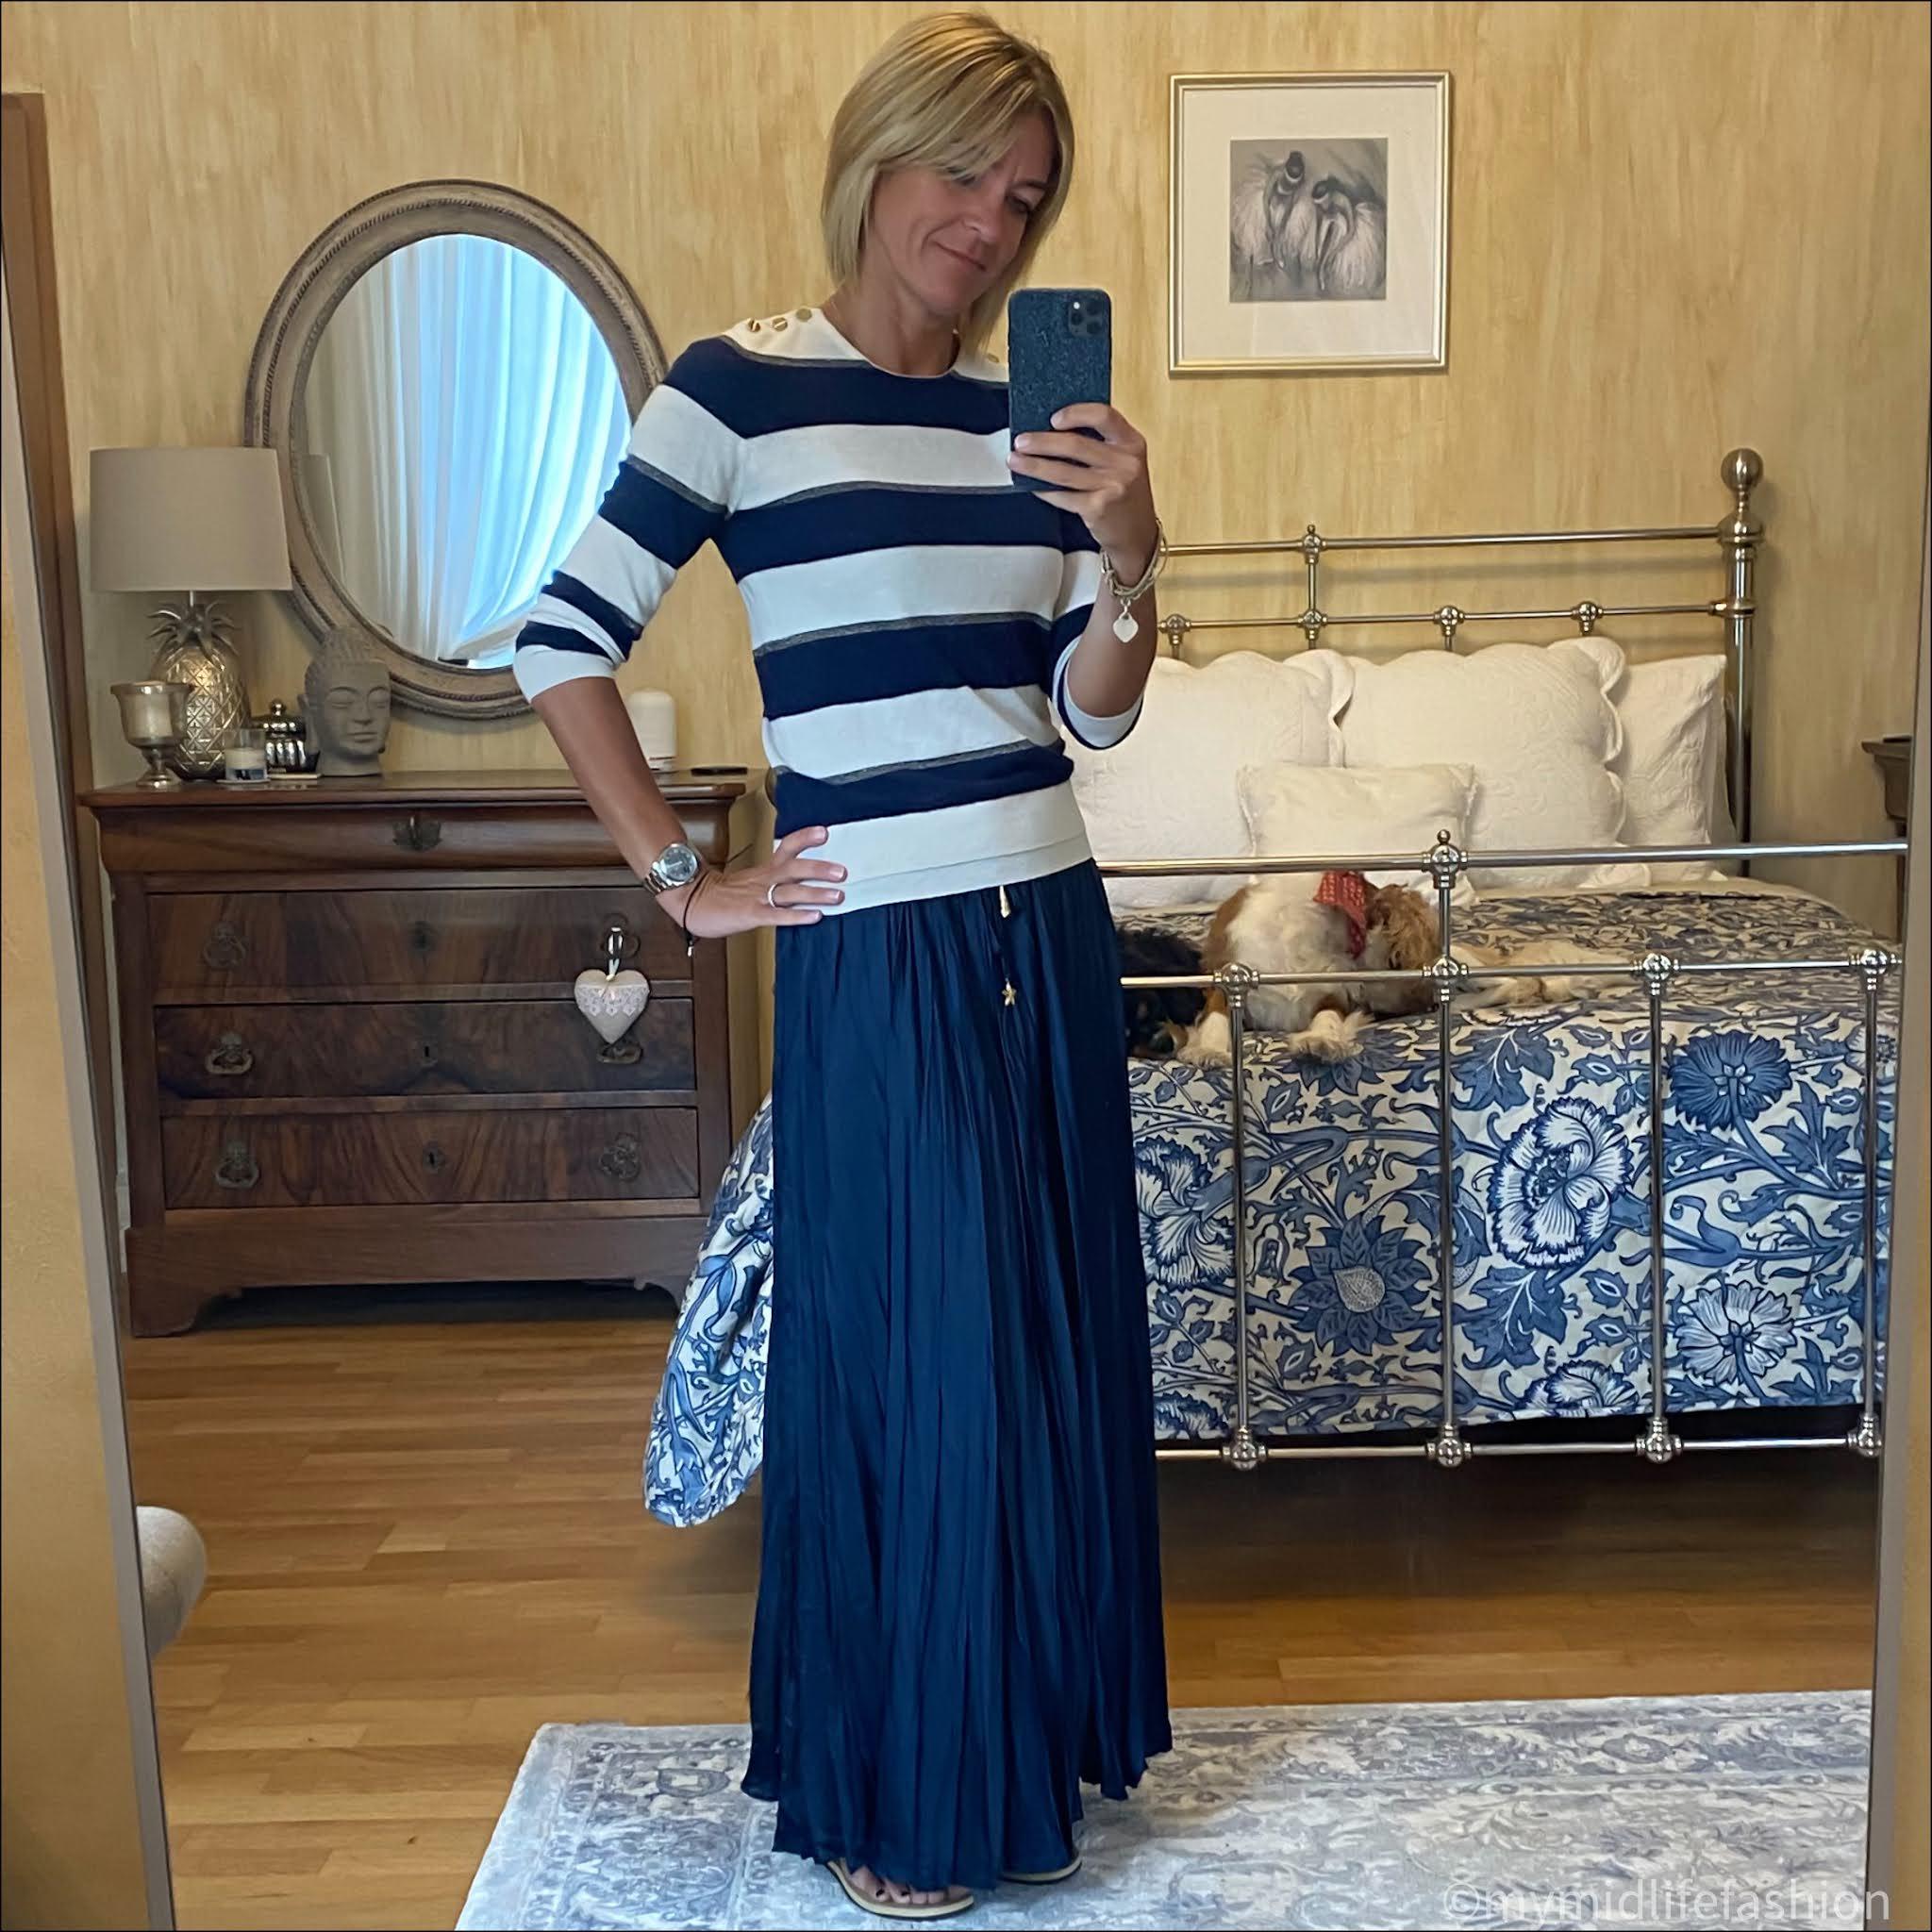 my midlife fashion, Joseph stripe cashmere jumper, zara wrinkled satin effect skirt, havaianas slim fit metallic flip flops